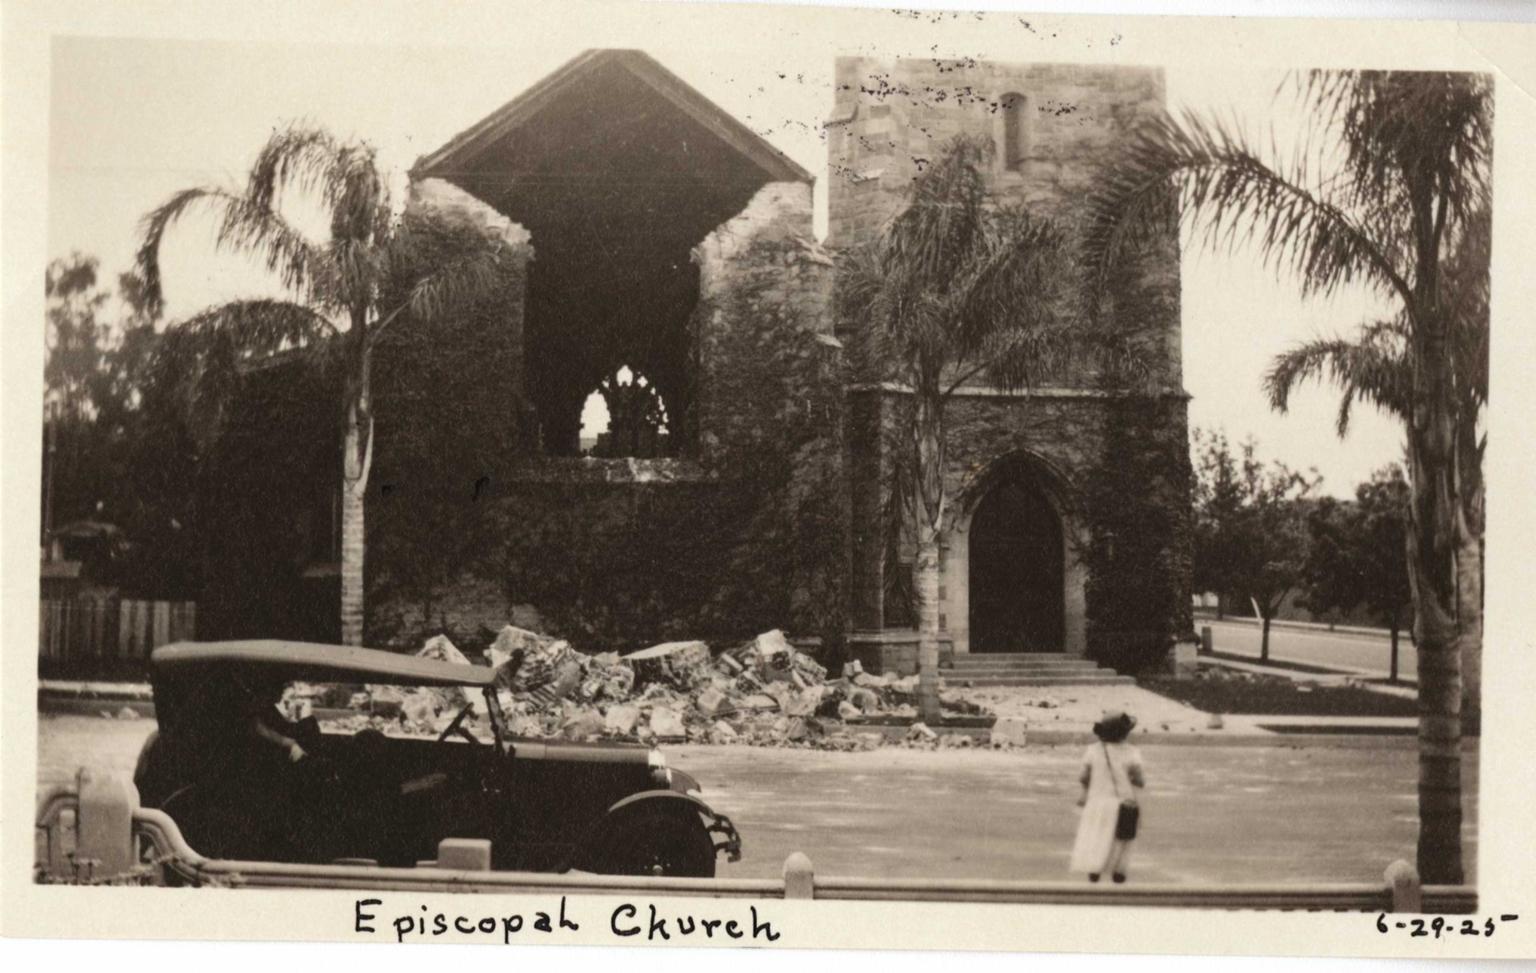 Santa Barbara 1925 Earthquake damage - Episcopal Church